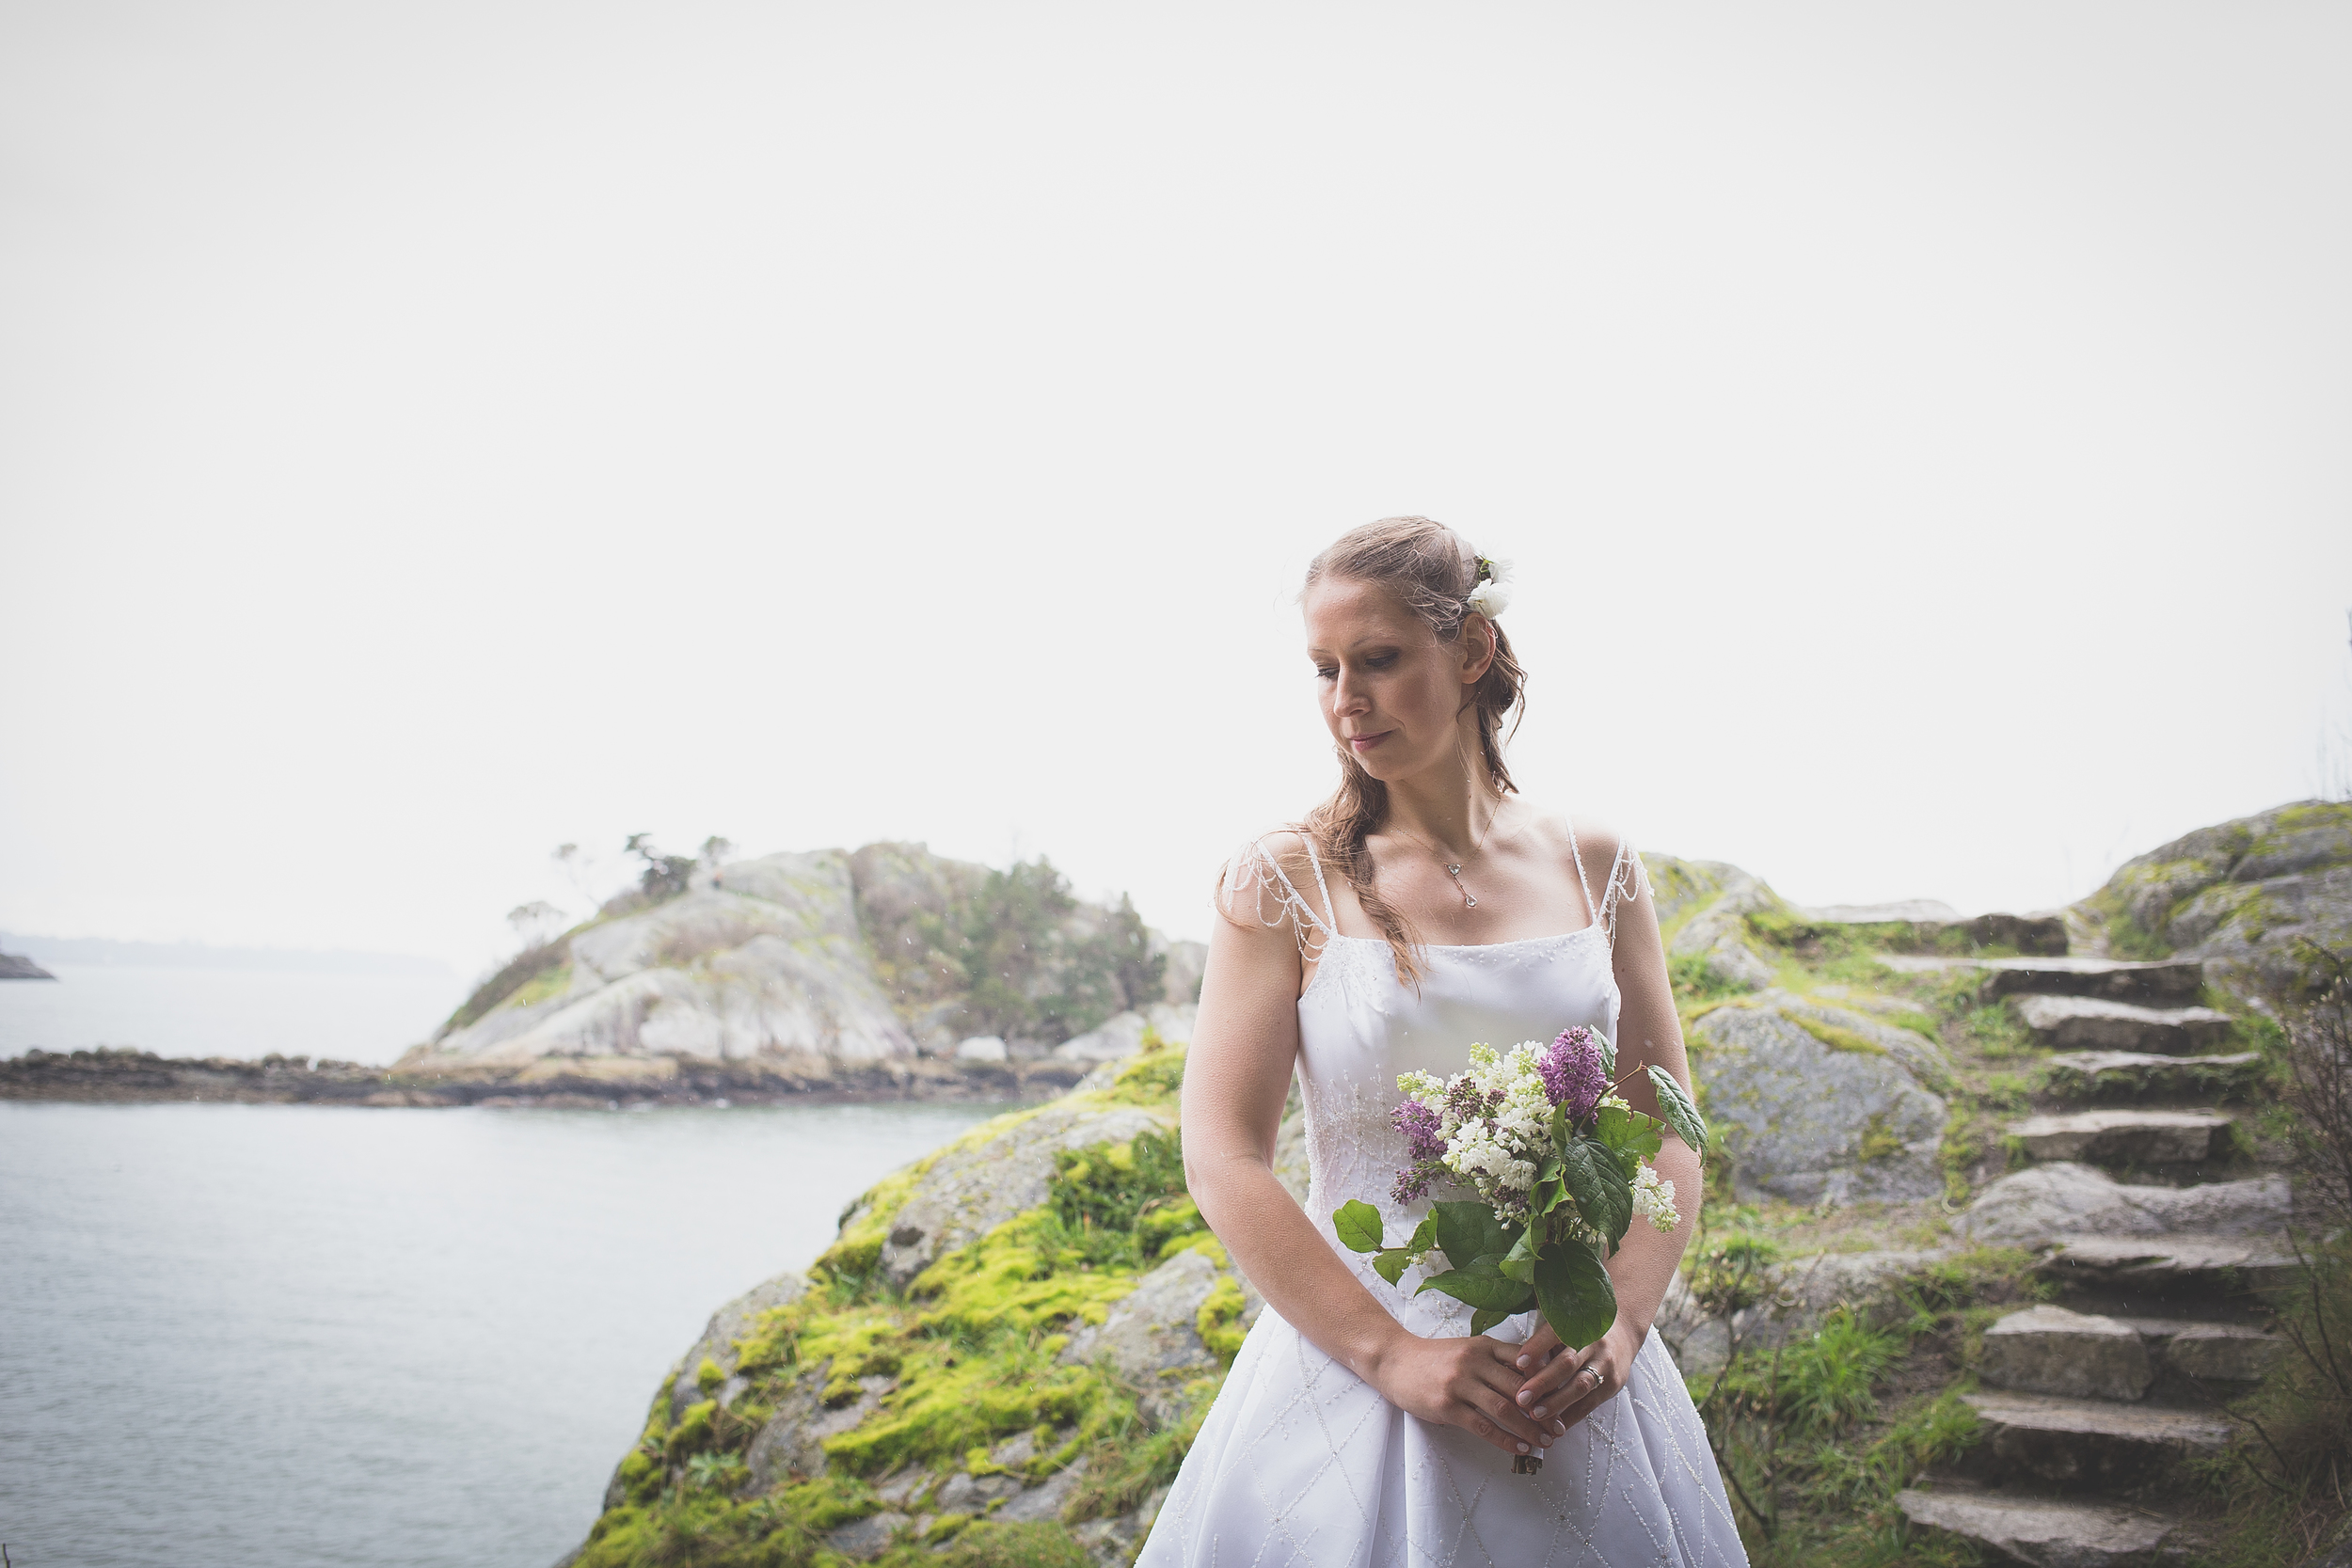 vancouver_photographer_wedding_DogwoodPhotography-6.jpg